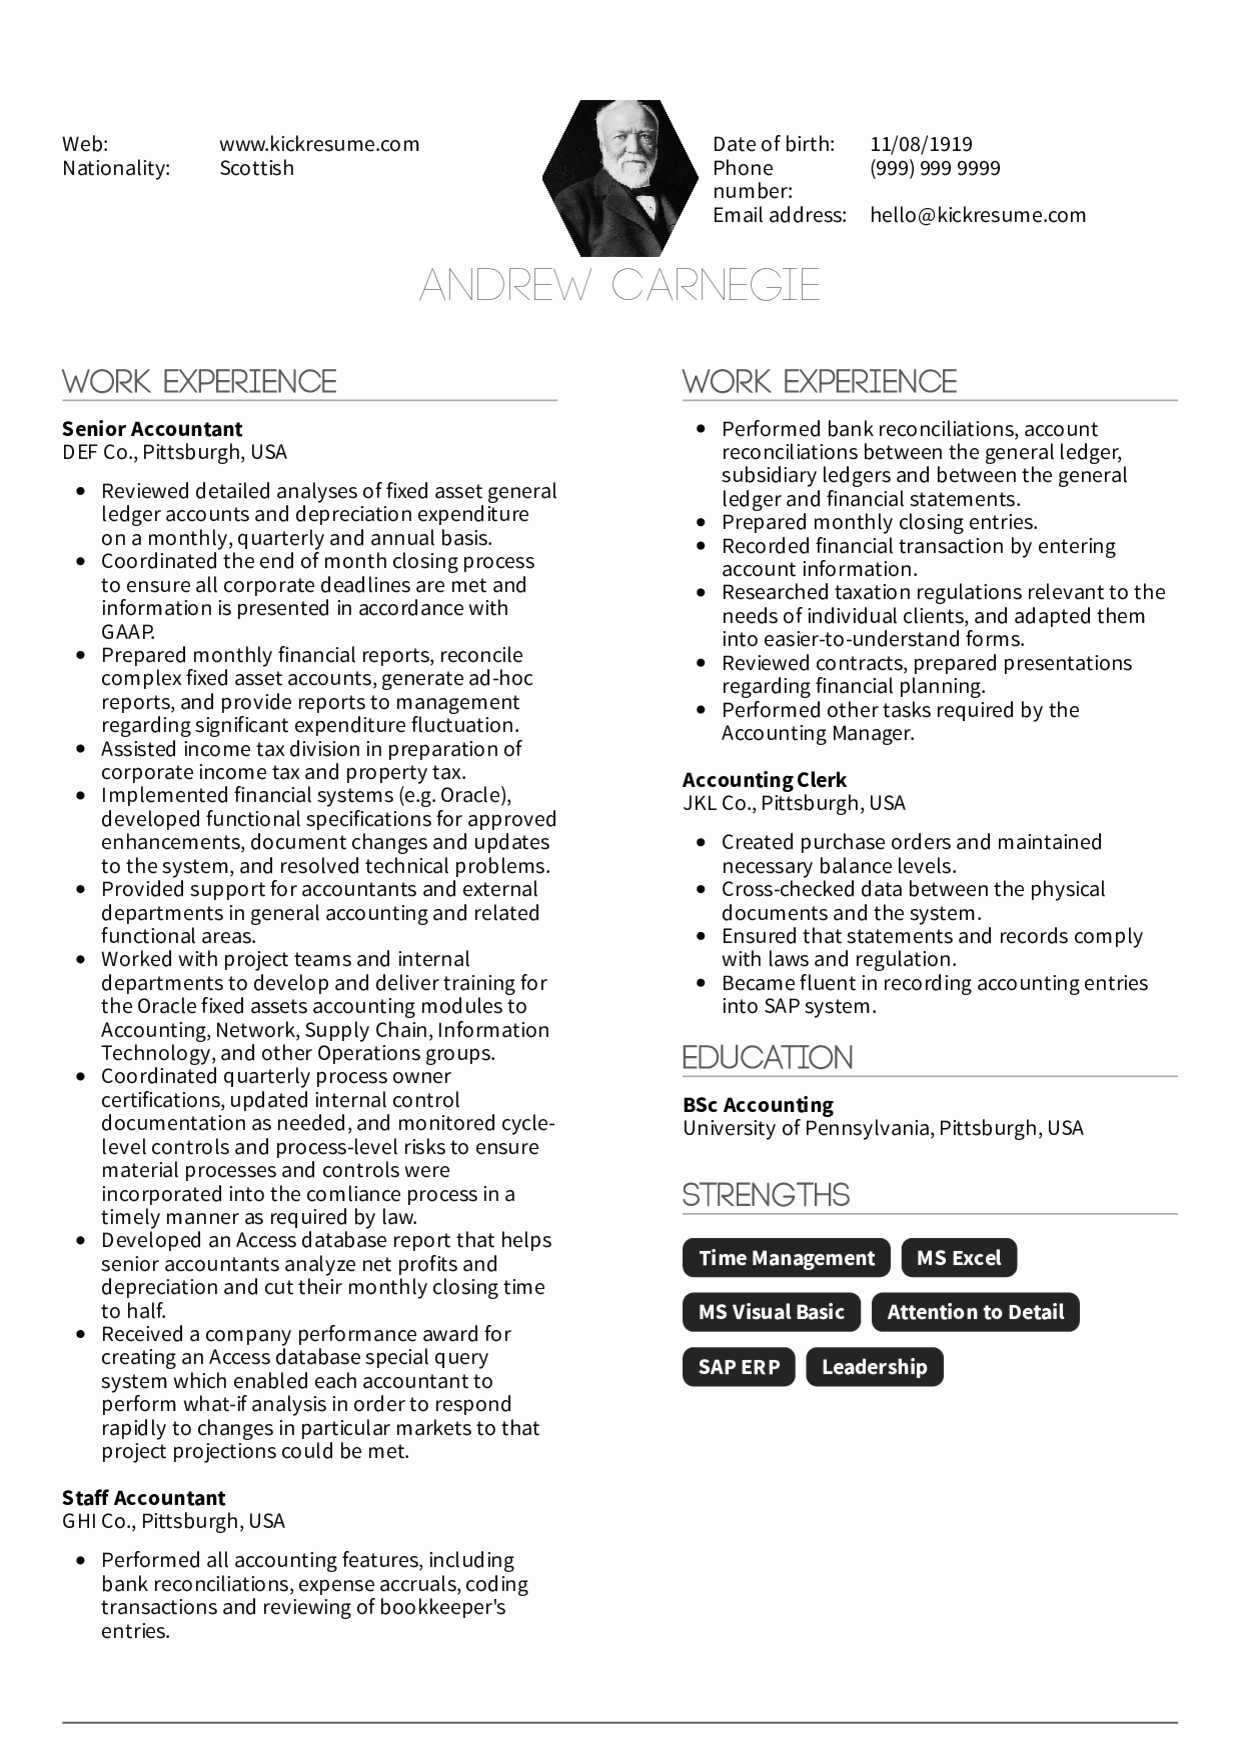 Senior Accountant Resume Sample Fresh Resume Examples by Real People Senior Accountant Resume Sample